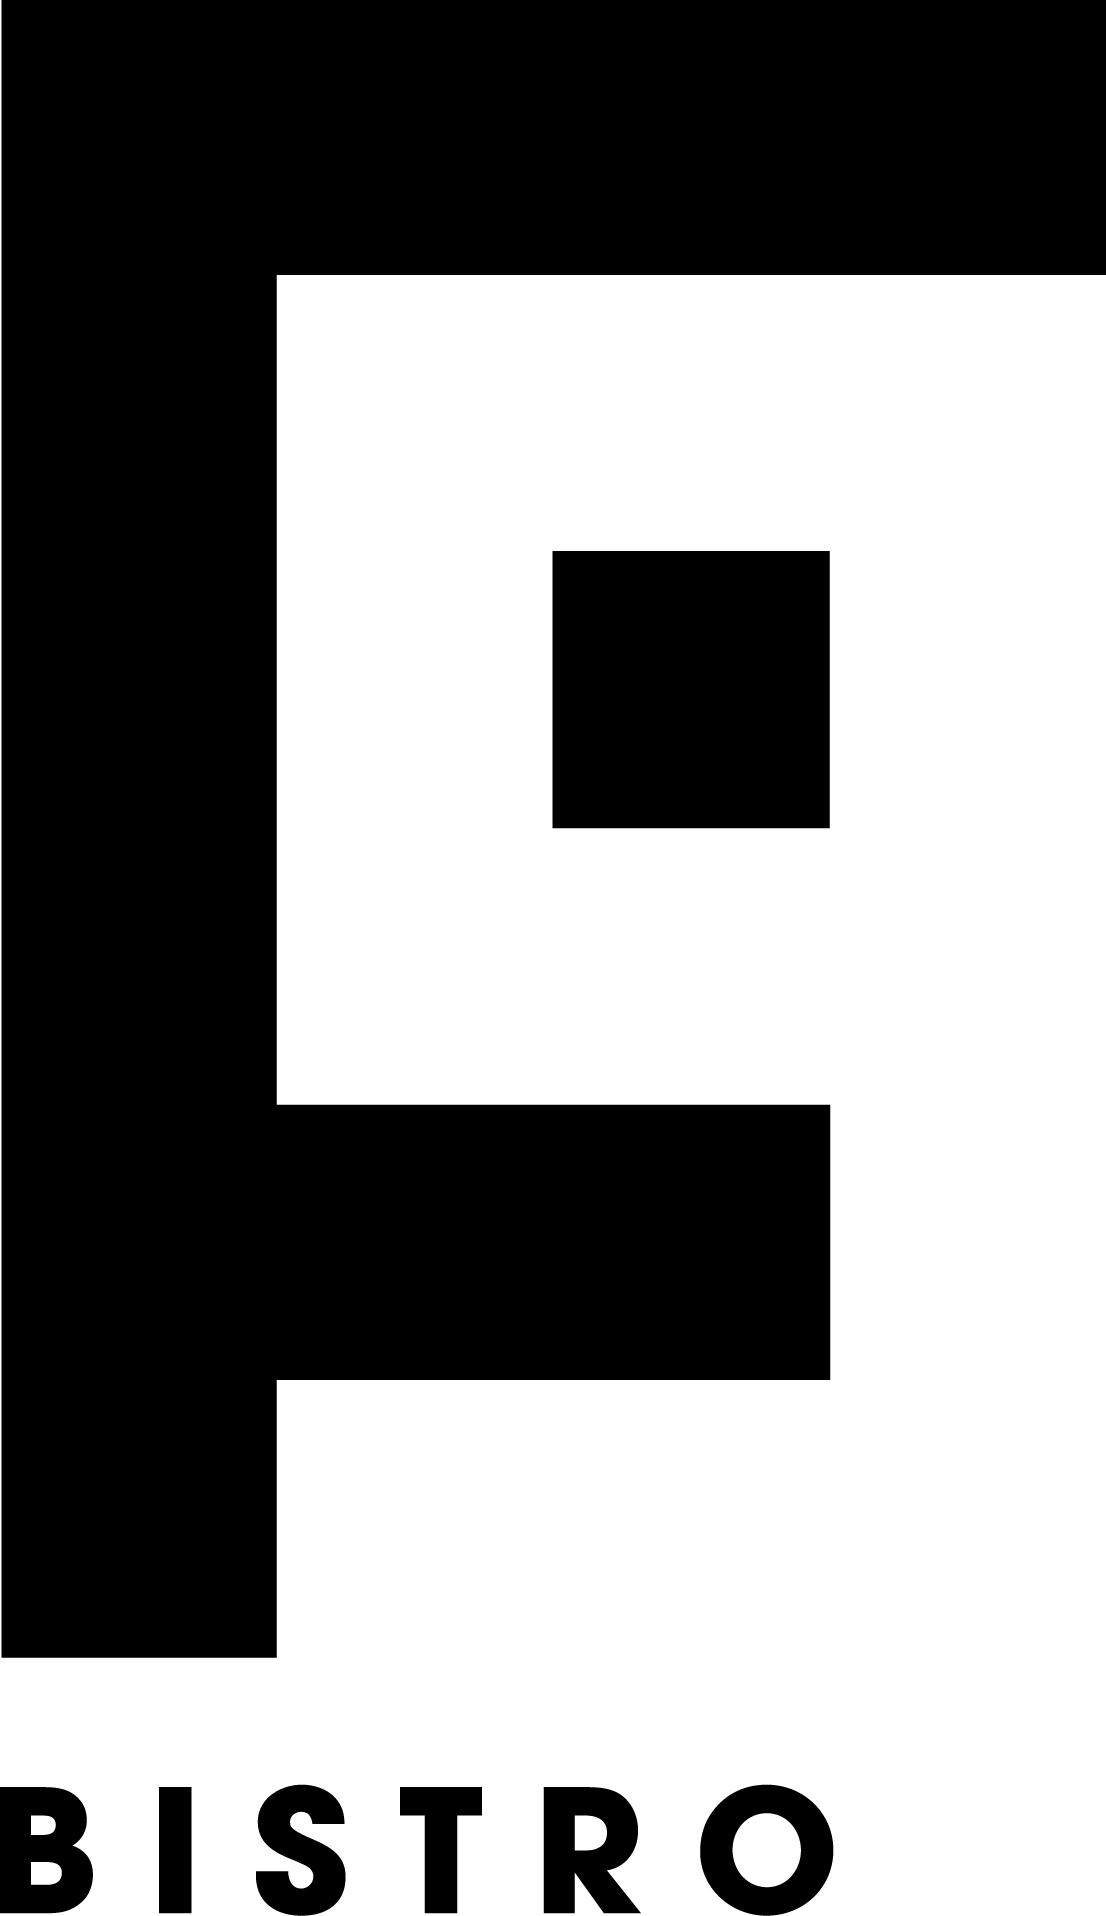 FG_Bistro_Logo.jpg